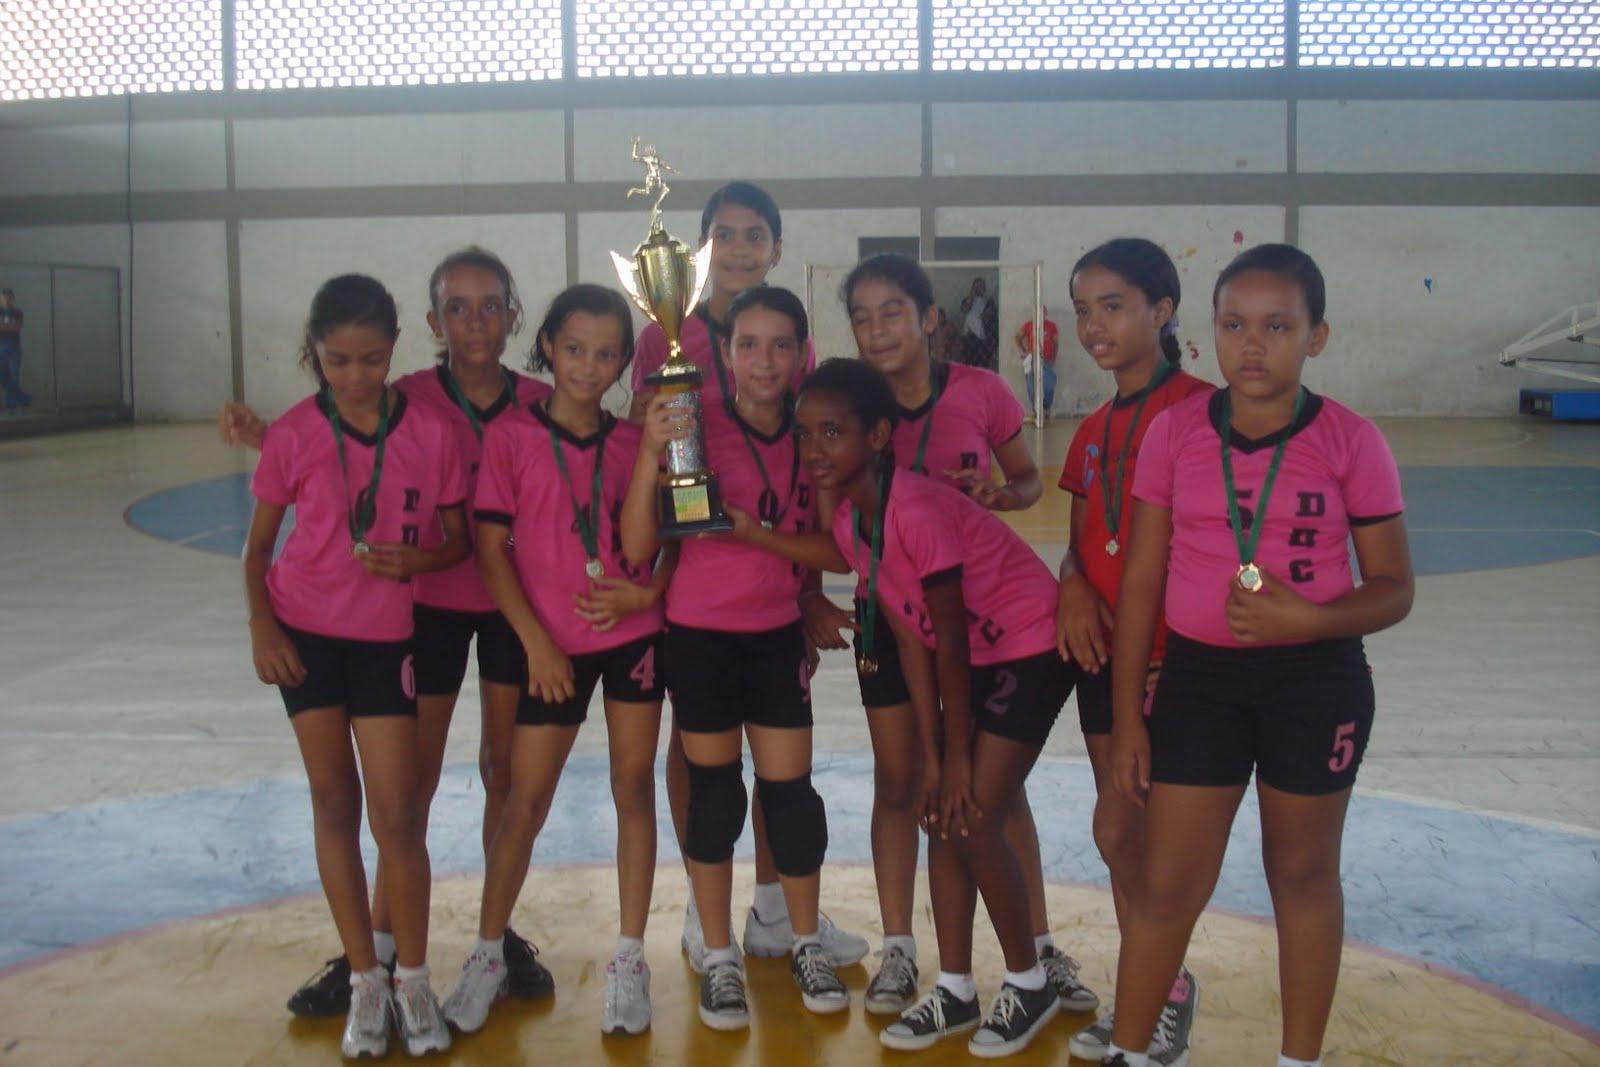 Caxias Ma Esportivo Campeoes No Futsal E Basquete Fecham